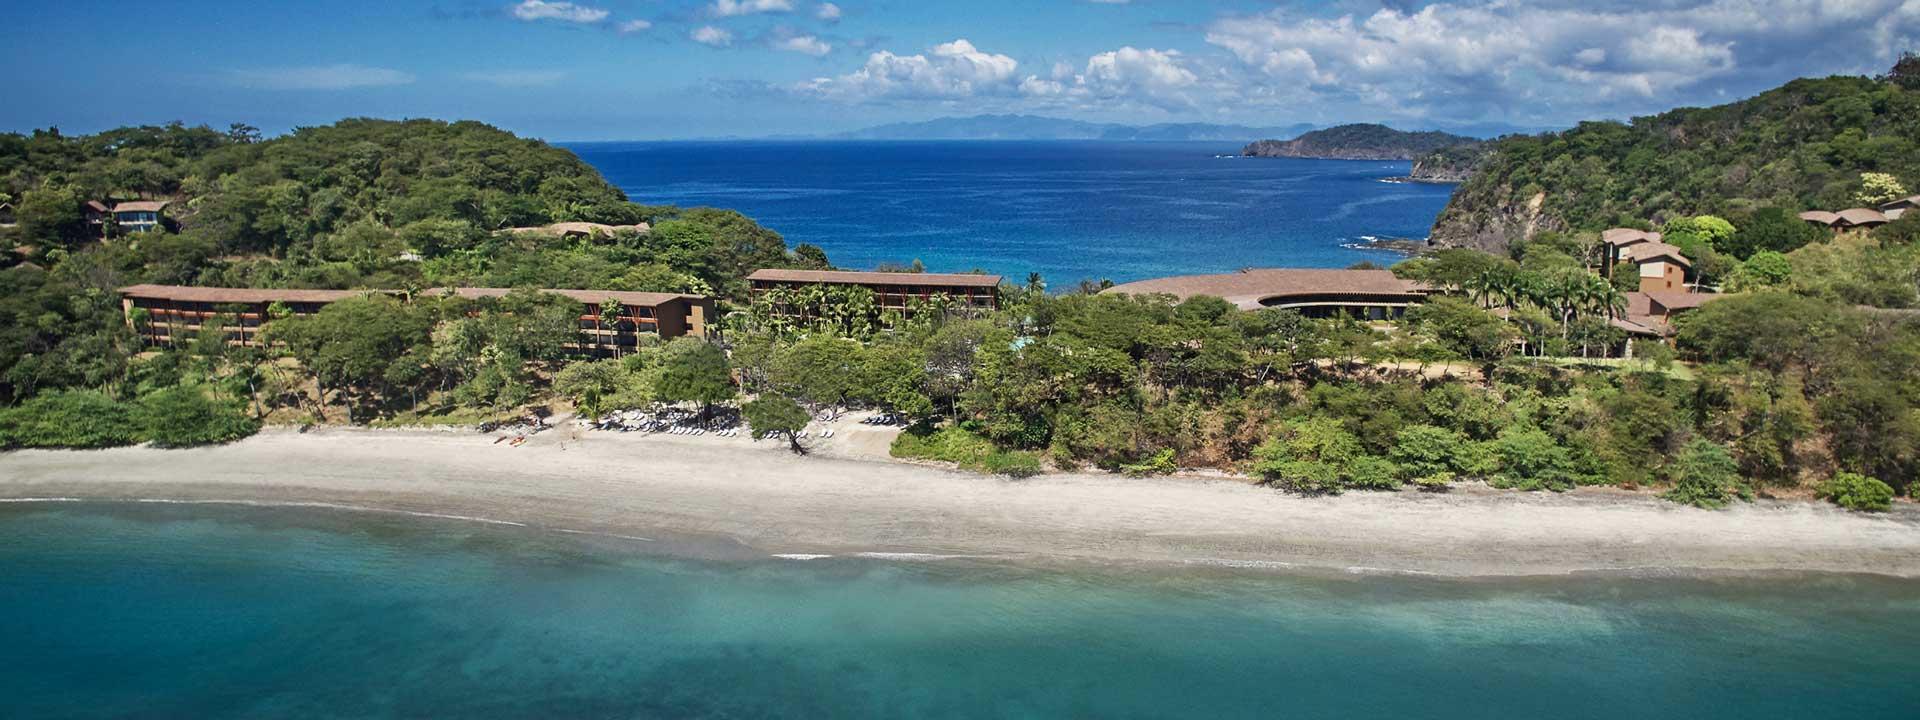 Four Seasons Resort Costa Rica Papagayo, GOLF's Top 100 Resorts